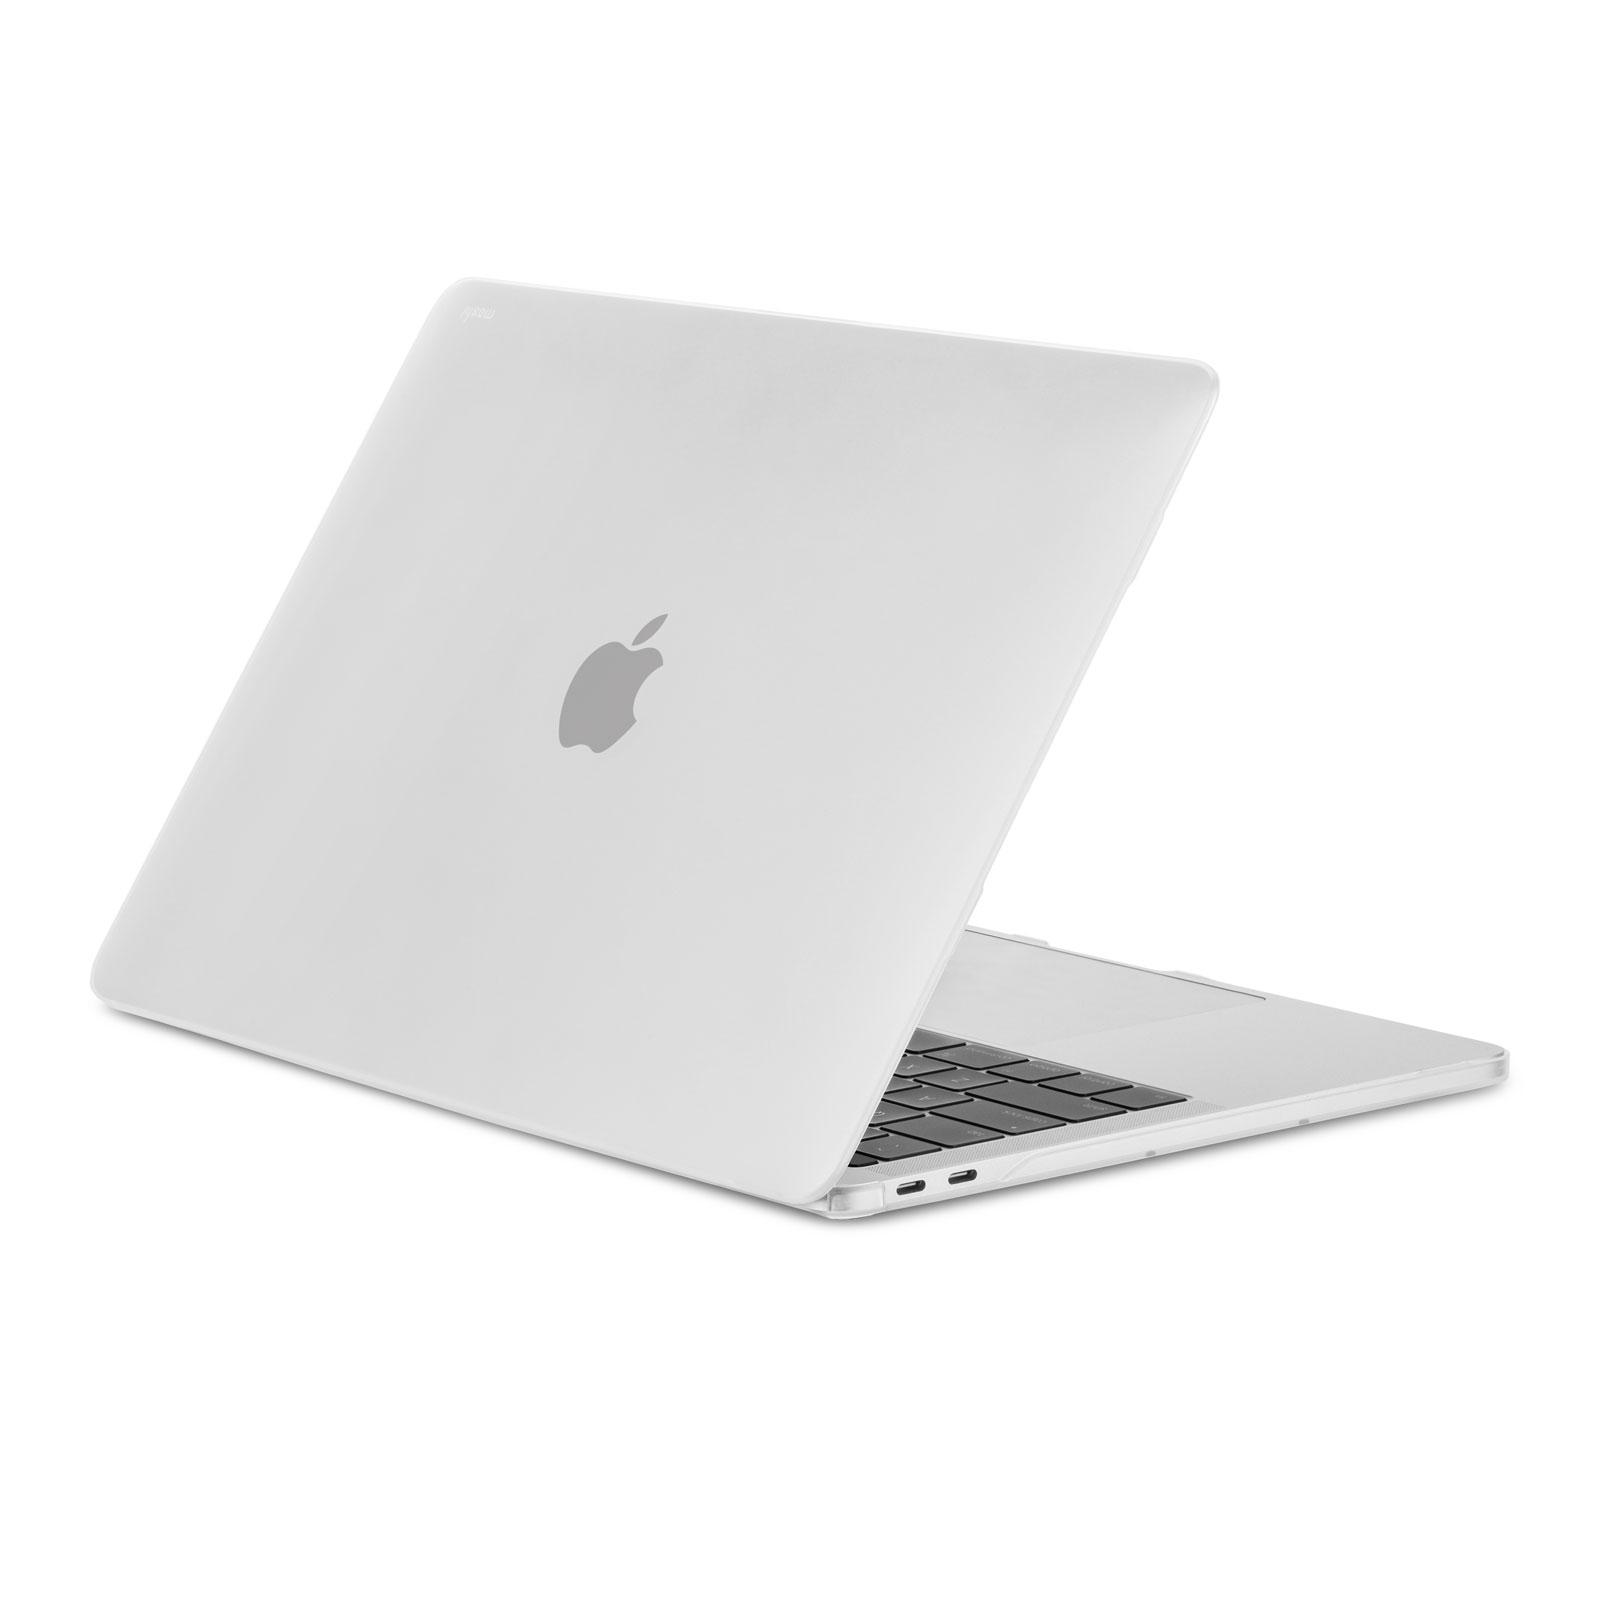 Чехол Moshi для Apple MacBook Pro Retina 13, 99MO071907, stealth clear чехол для ноутбука macbook pro 13 moshi muse 13 черный 99mo034004